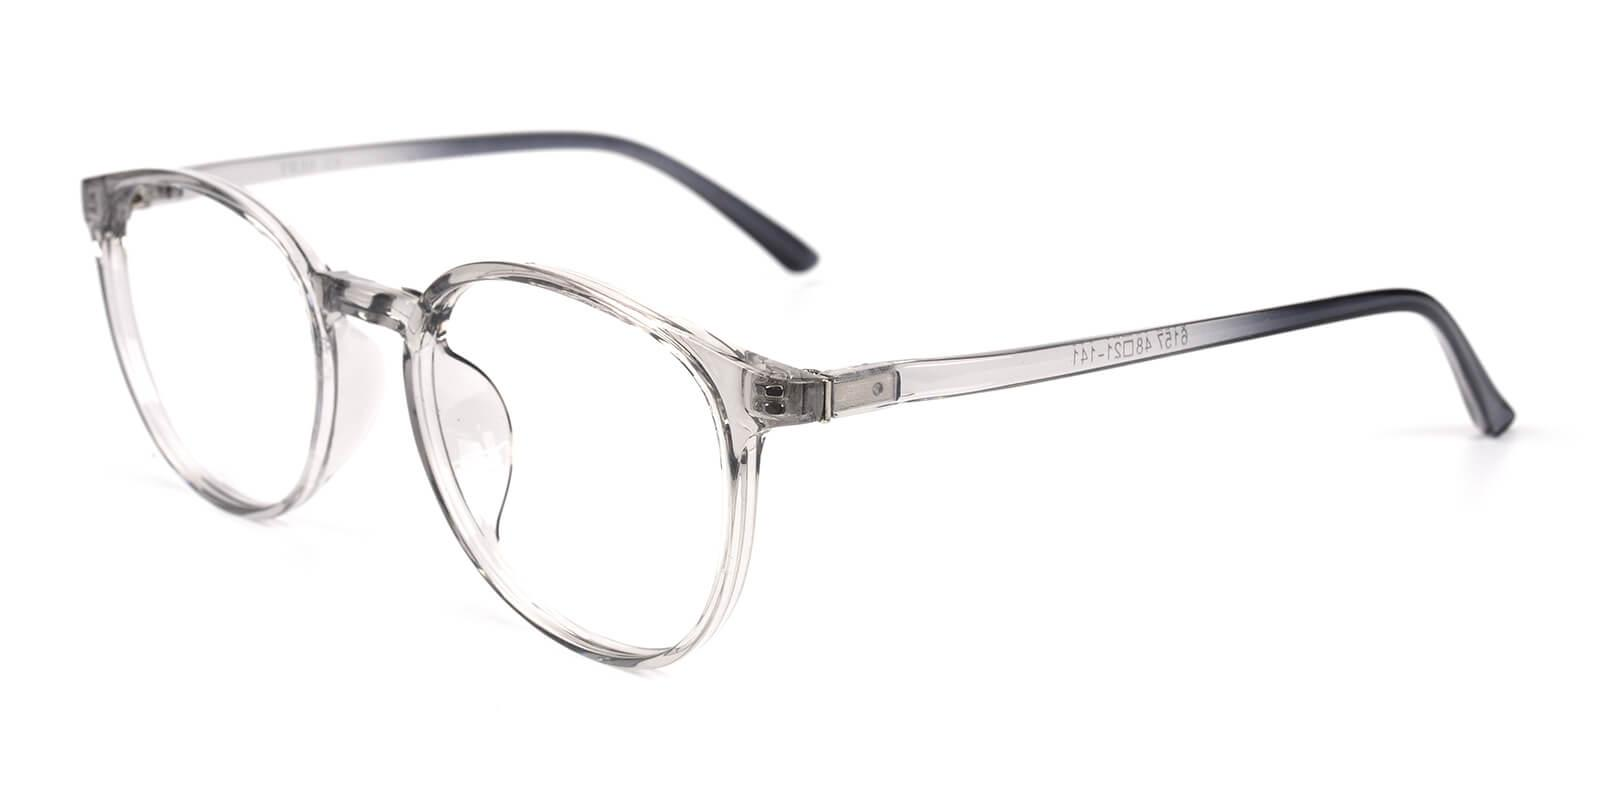 Aure-Gray-Round-TR-Eyeglasses-additional1